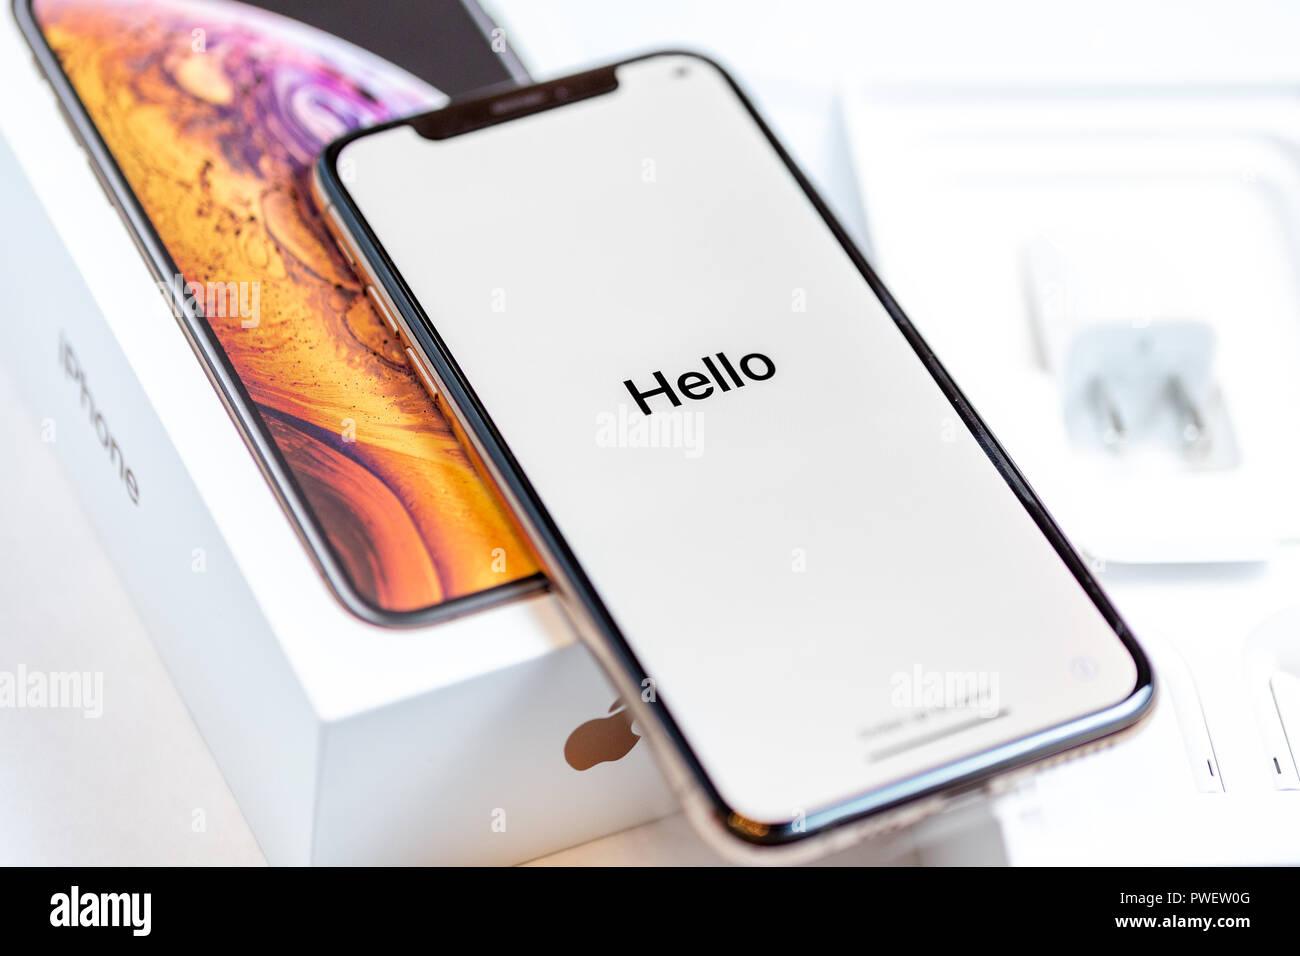 12 oktober 2018 kiew ukraine iphone xs sp testens am. Black Bedroom Furniture Sets. Home Design Ideas